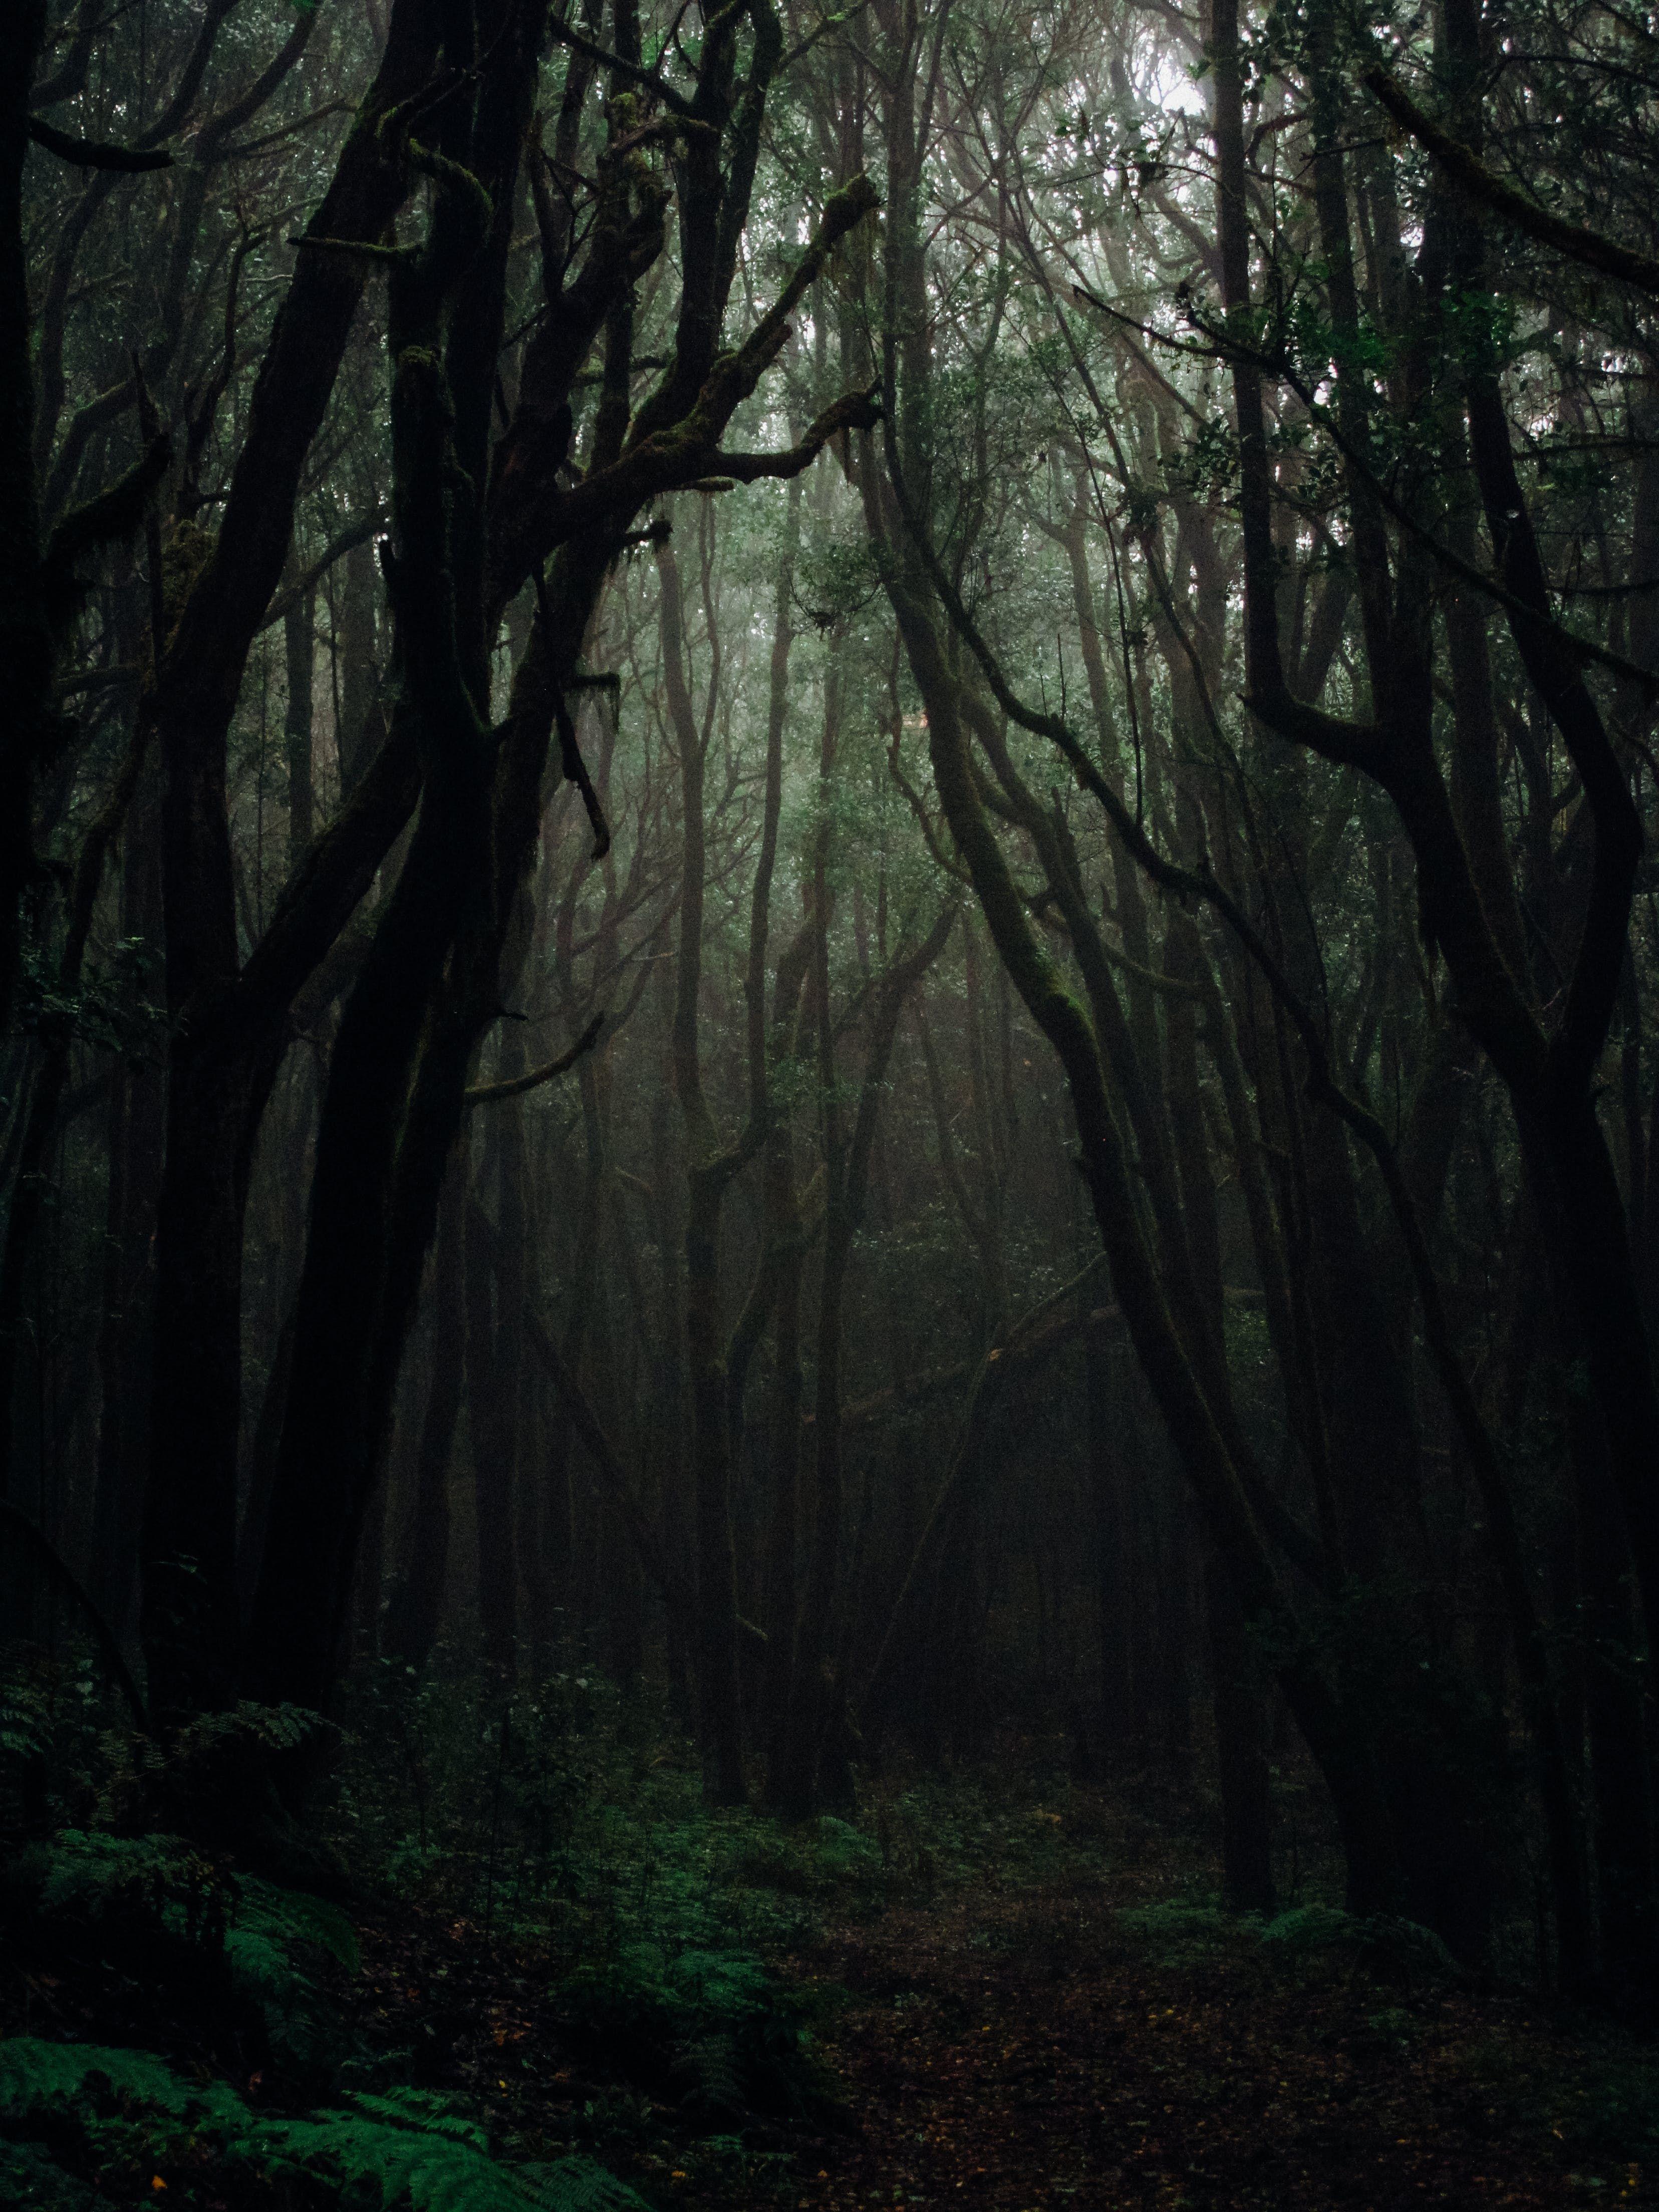 New Free Stock Photo Of Dark Daylight Eerie Forest Photography Forest Photos Dark Forest